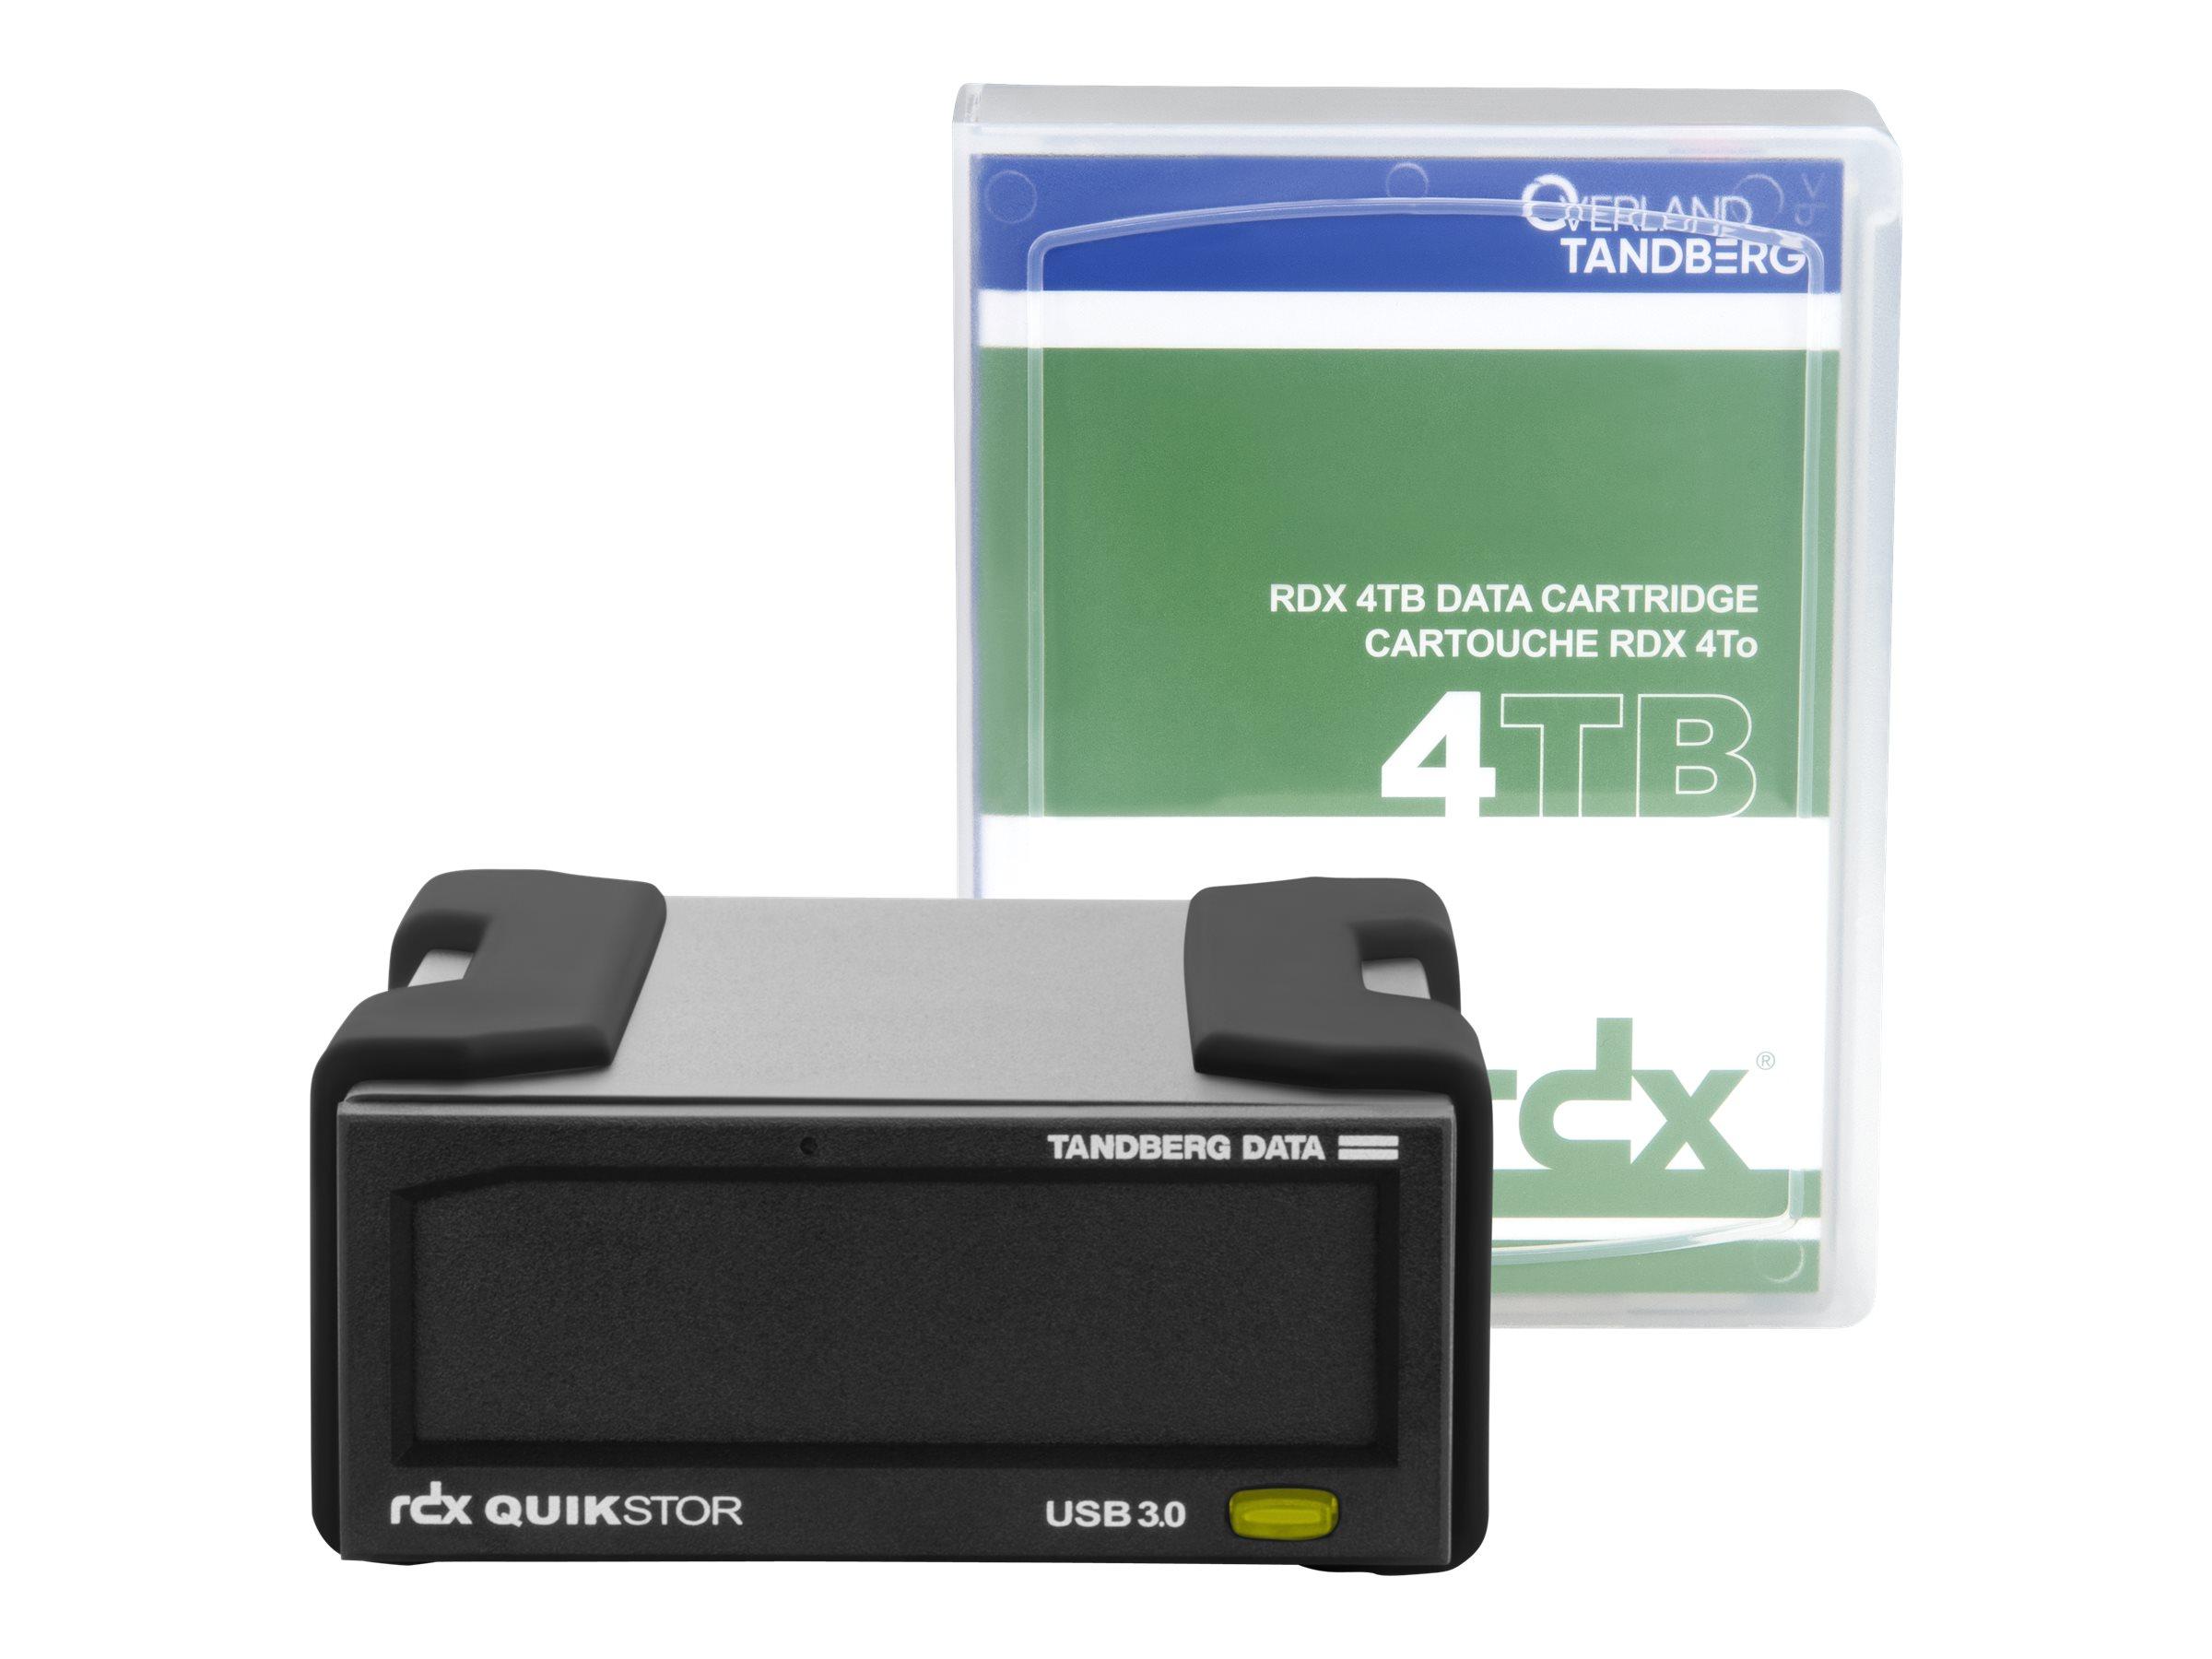 Overland Tandberg RDX QuikStor - Laufwerk - RDX - SuperSpeed USB 3.0 - extern - mit 4-TB-Kassette